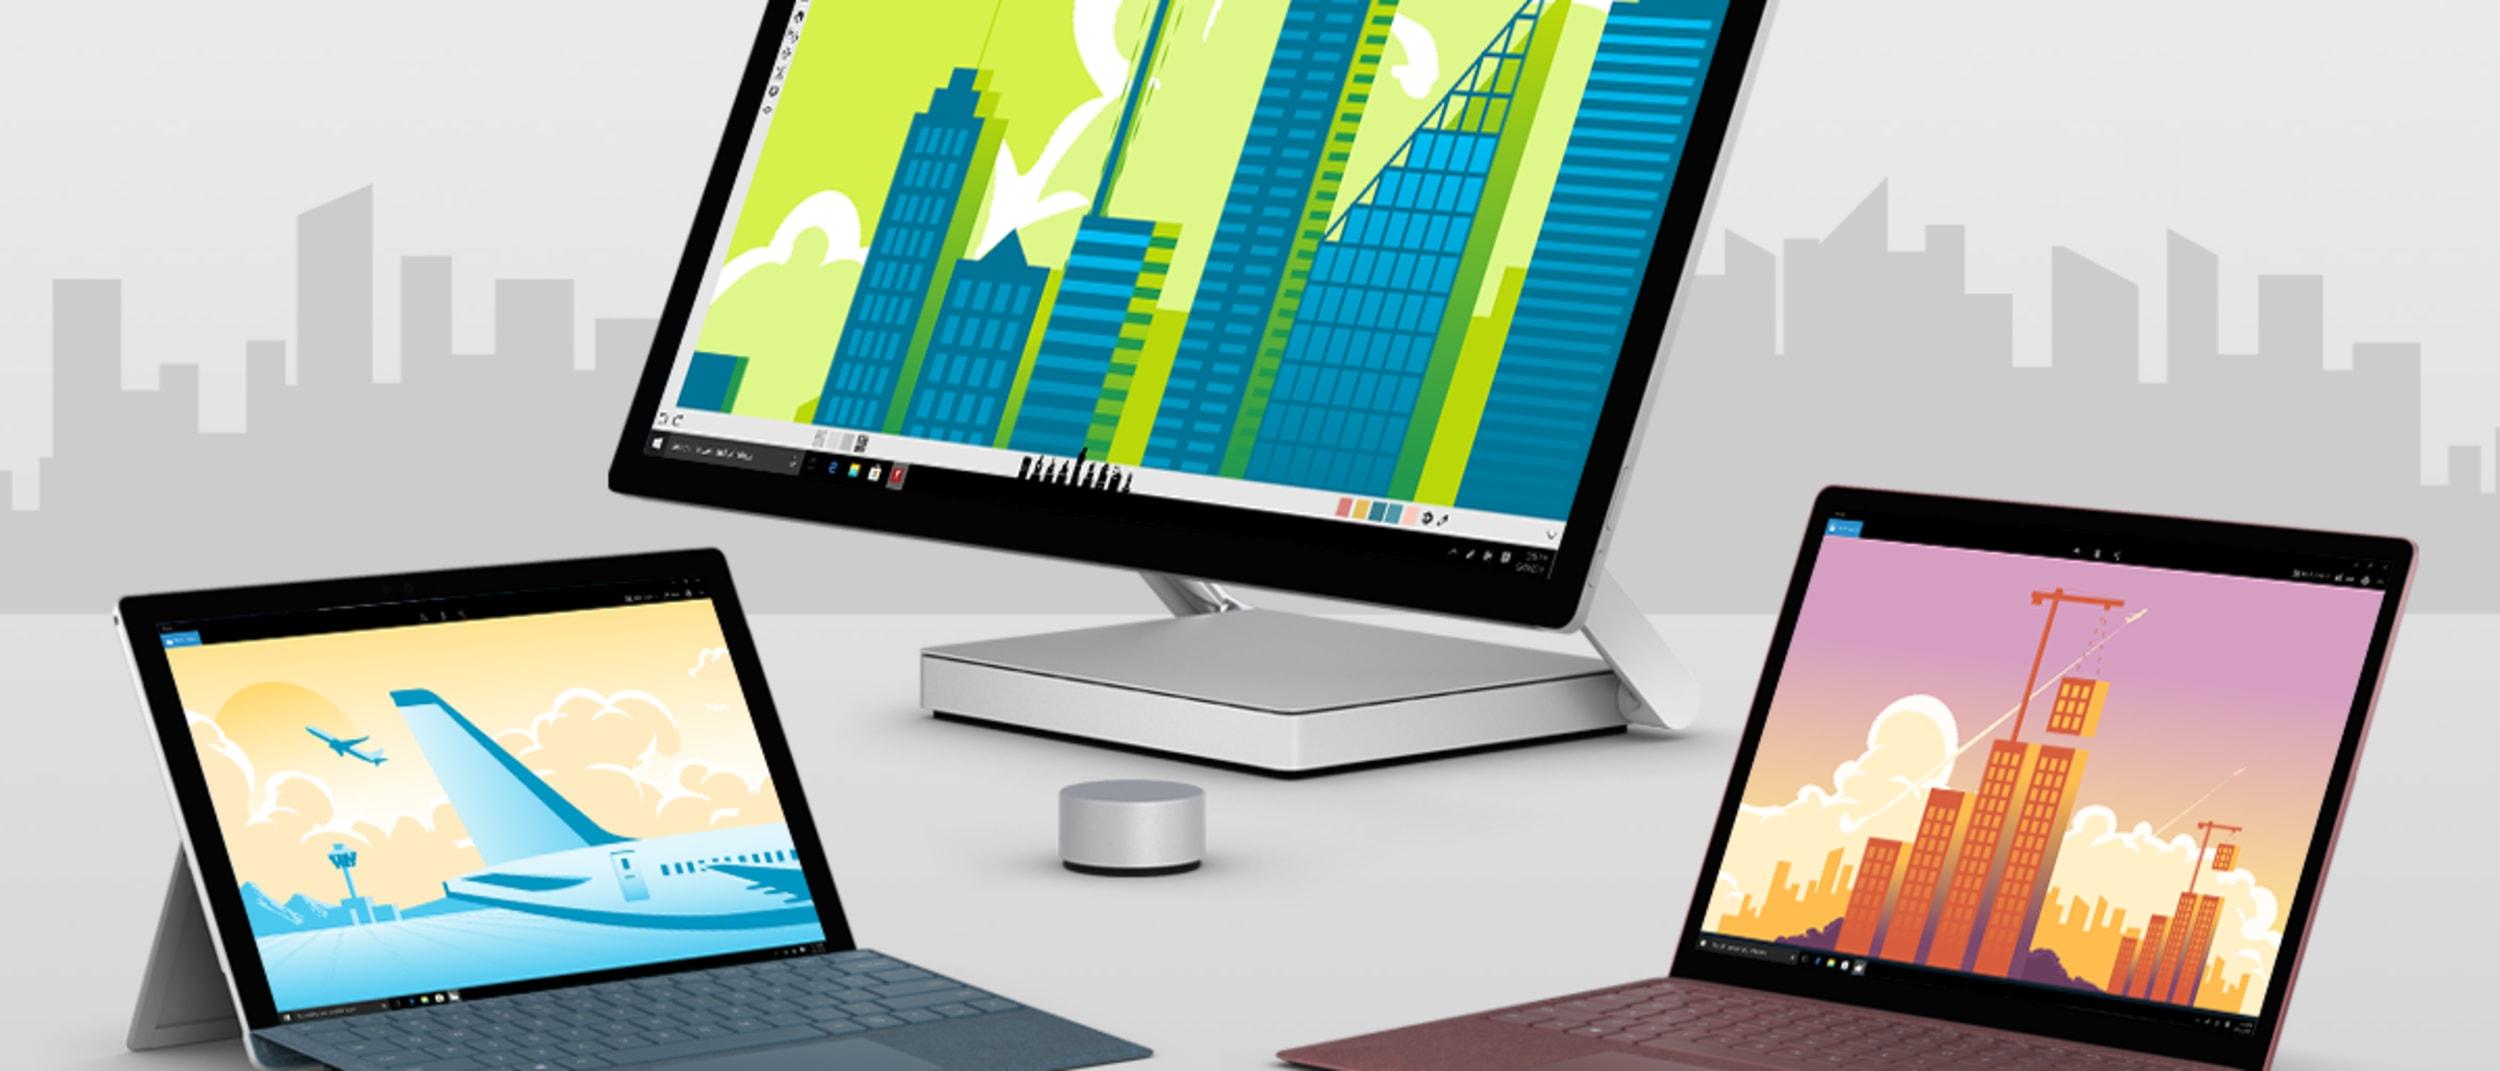 Microsoft: Save 15% on select Surface